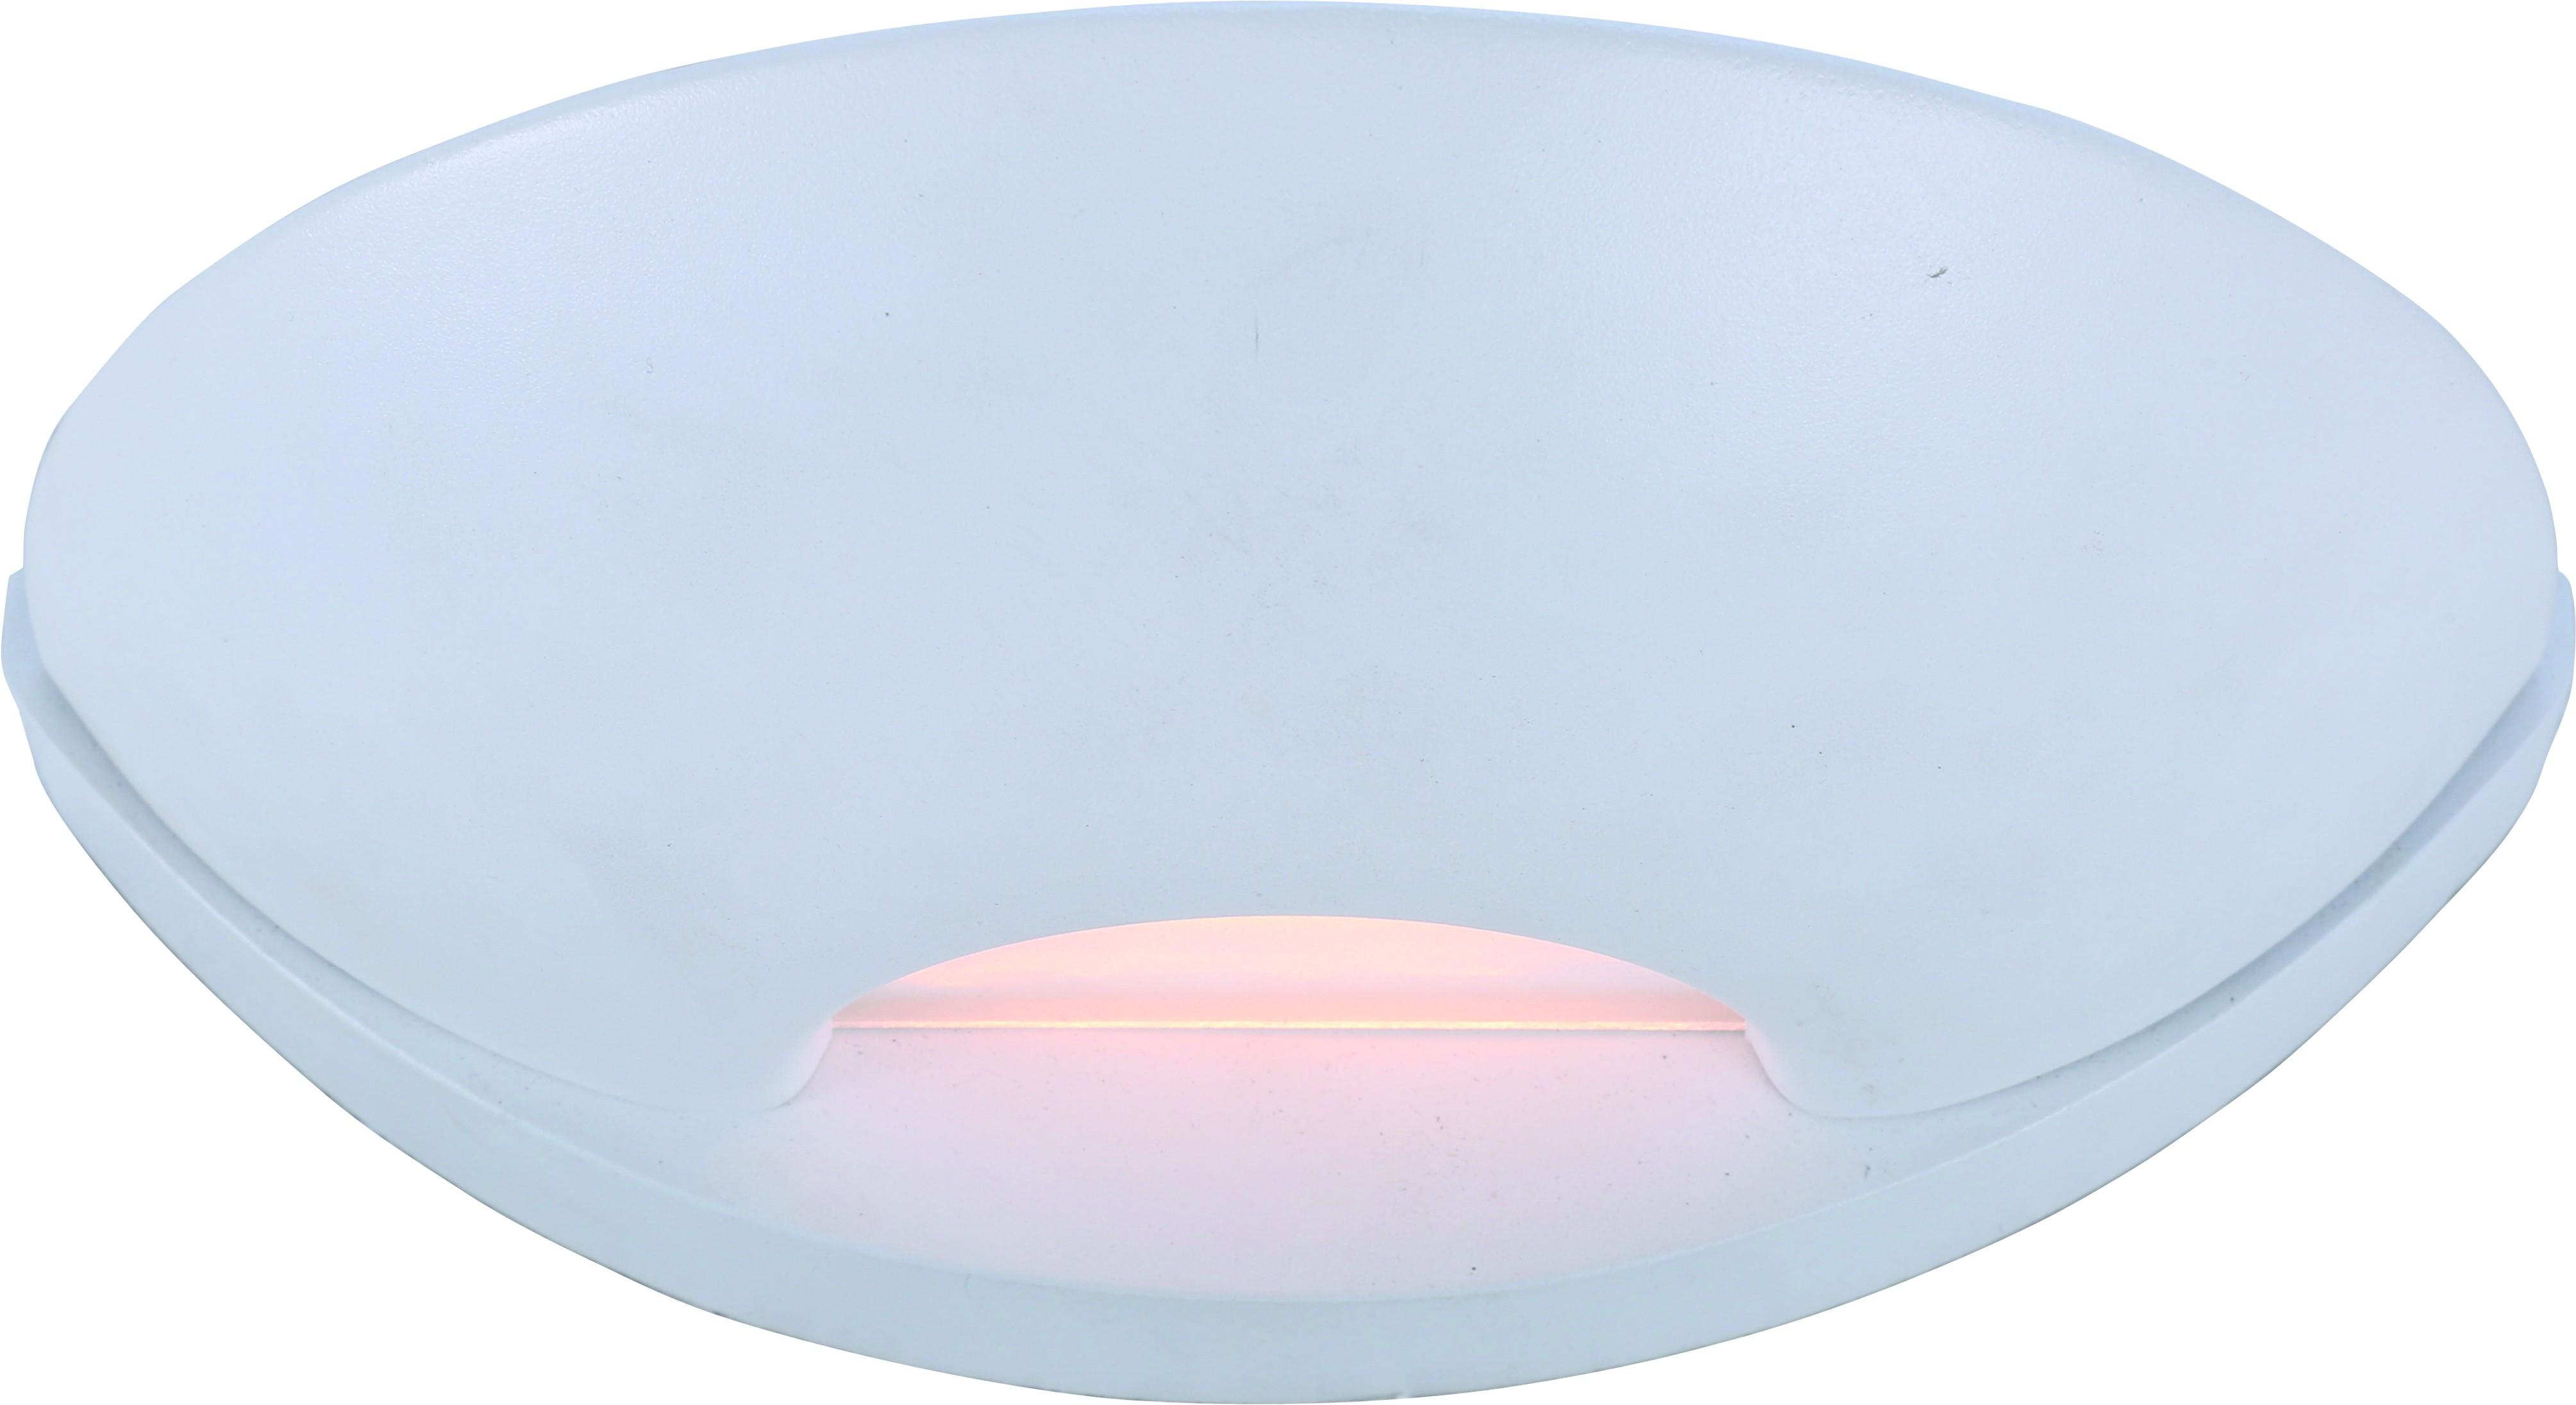 Бра Arte lamp A7107ap-1wh бра arte lamp interior a7107ap 1ab